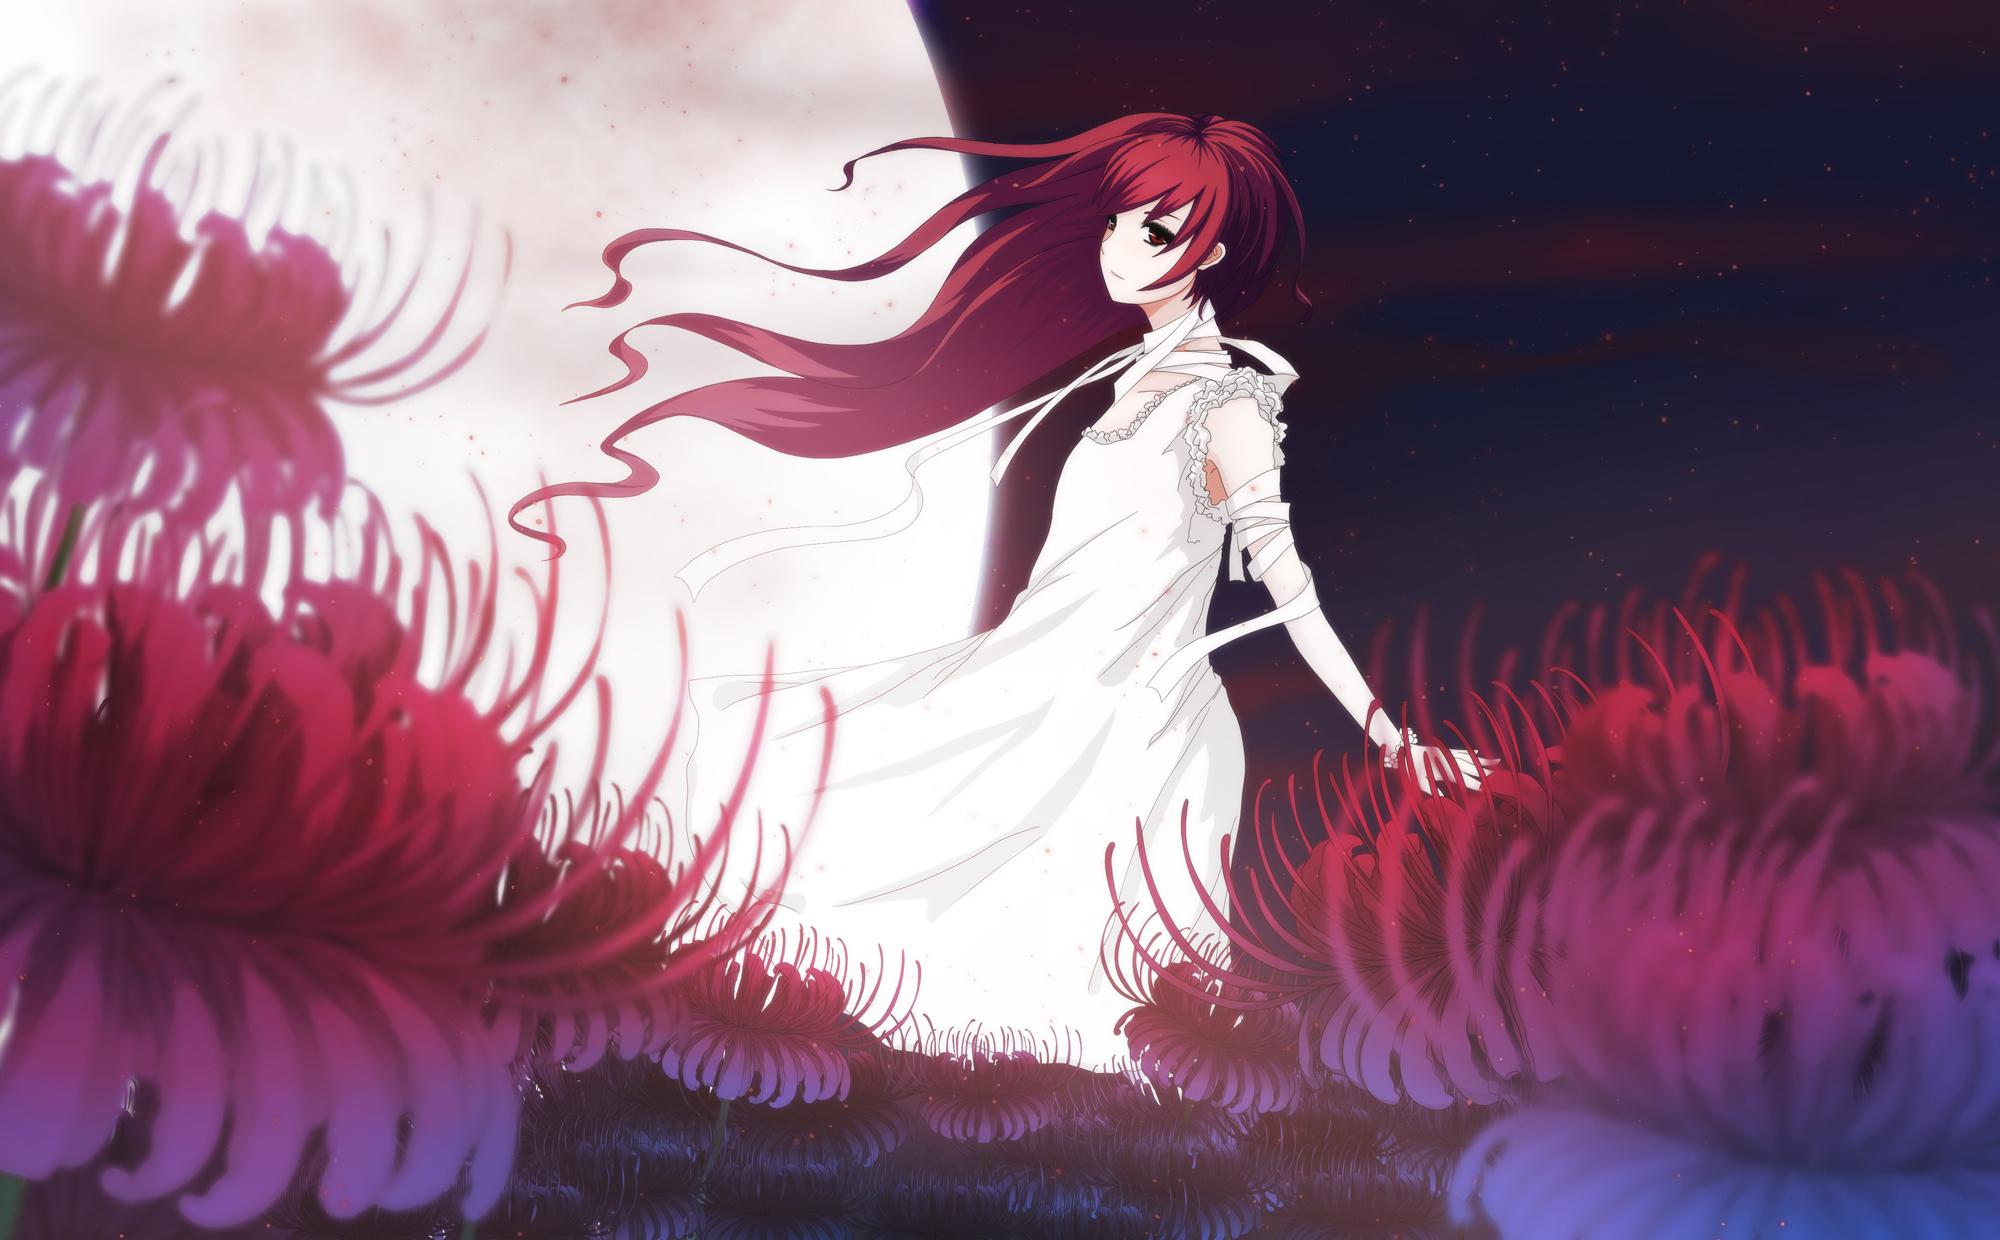 bandage delant dress flowers long_hair moon red_hair tagme